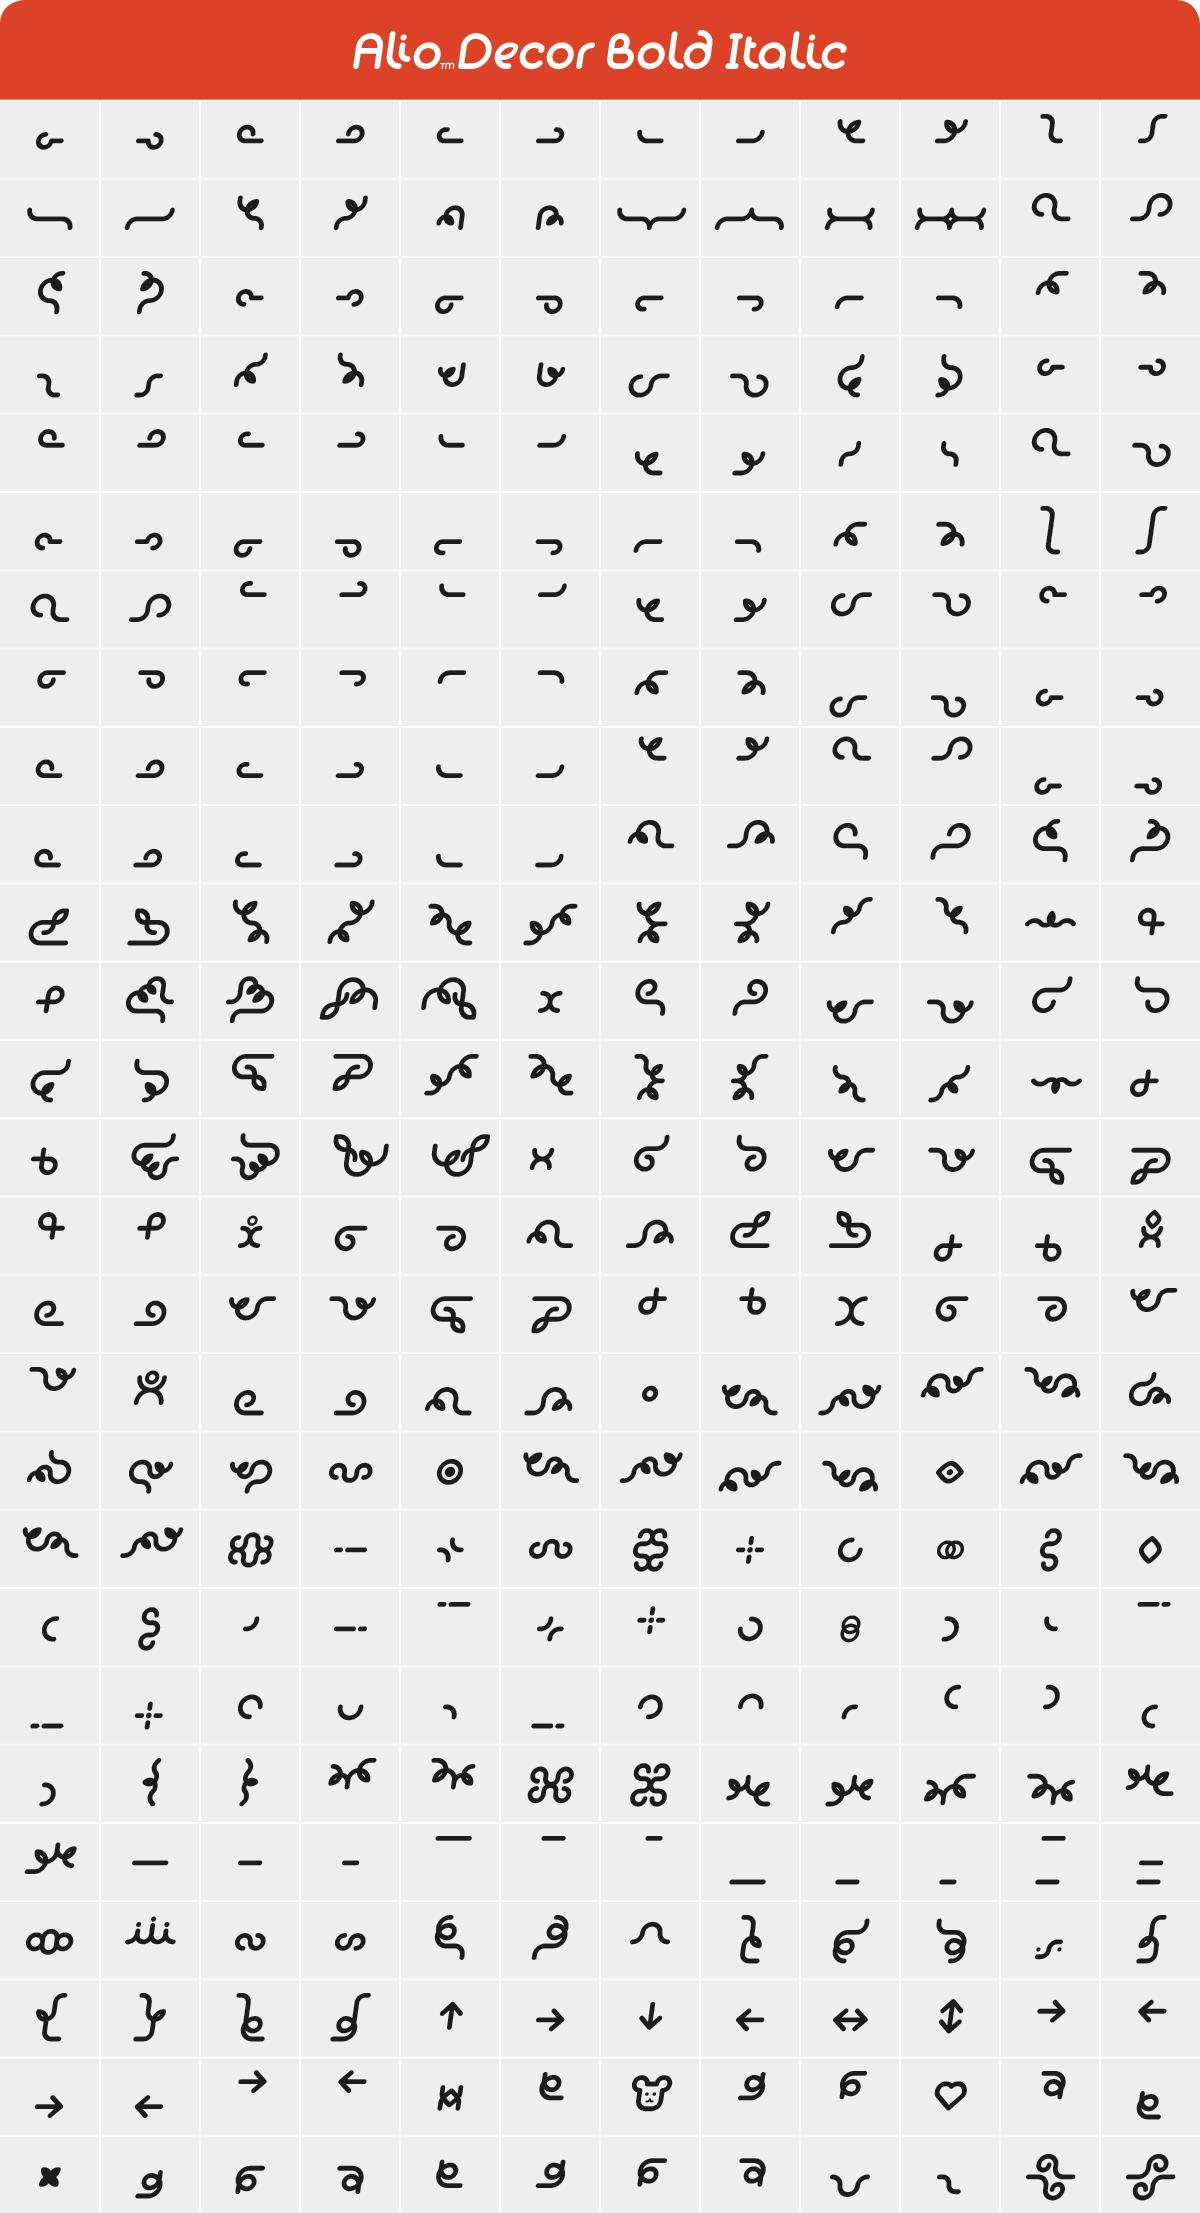 Alio Decor Bold Italic Glyph Set